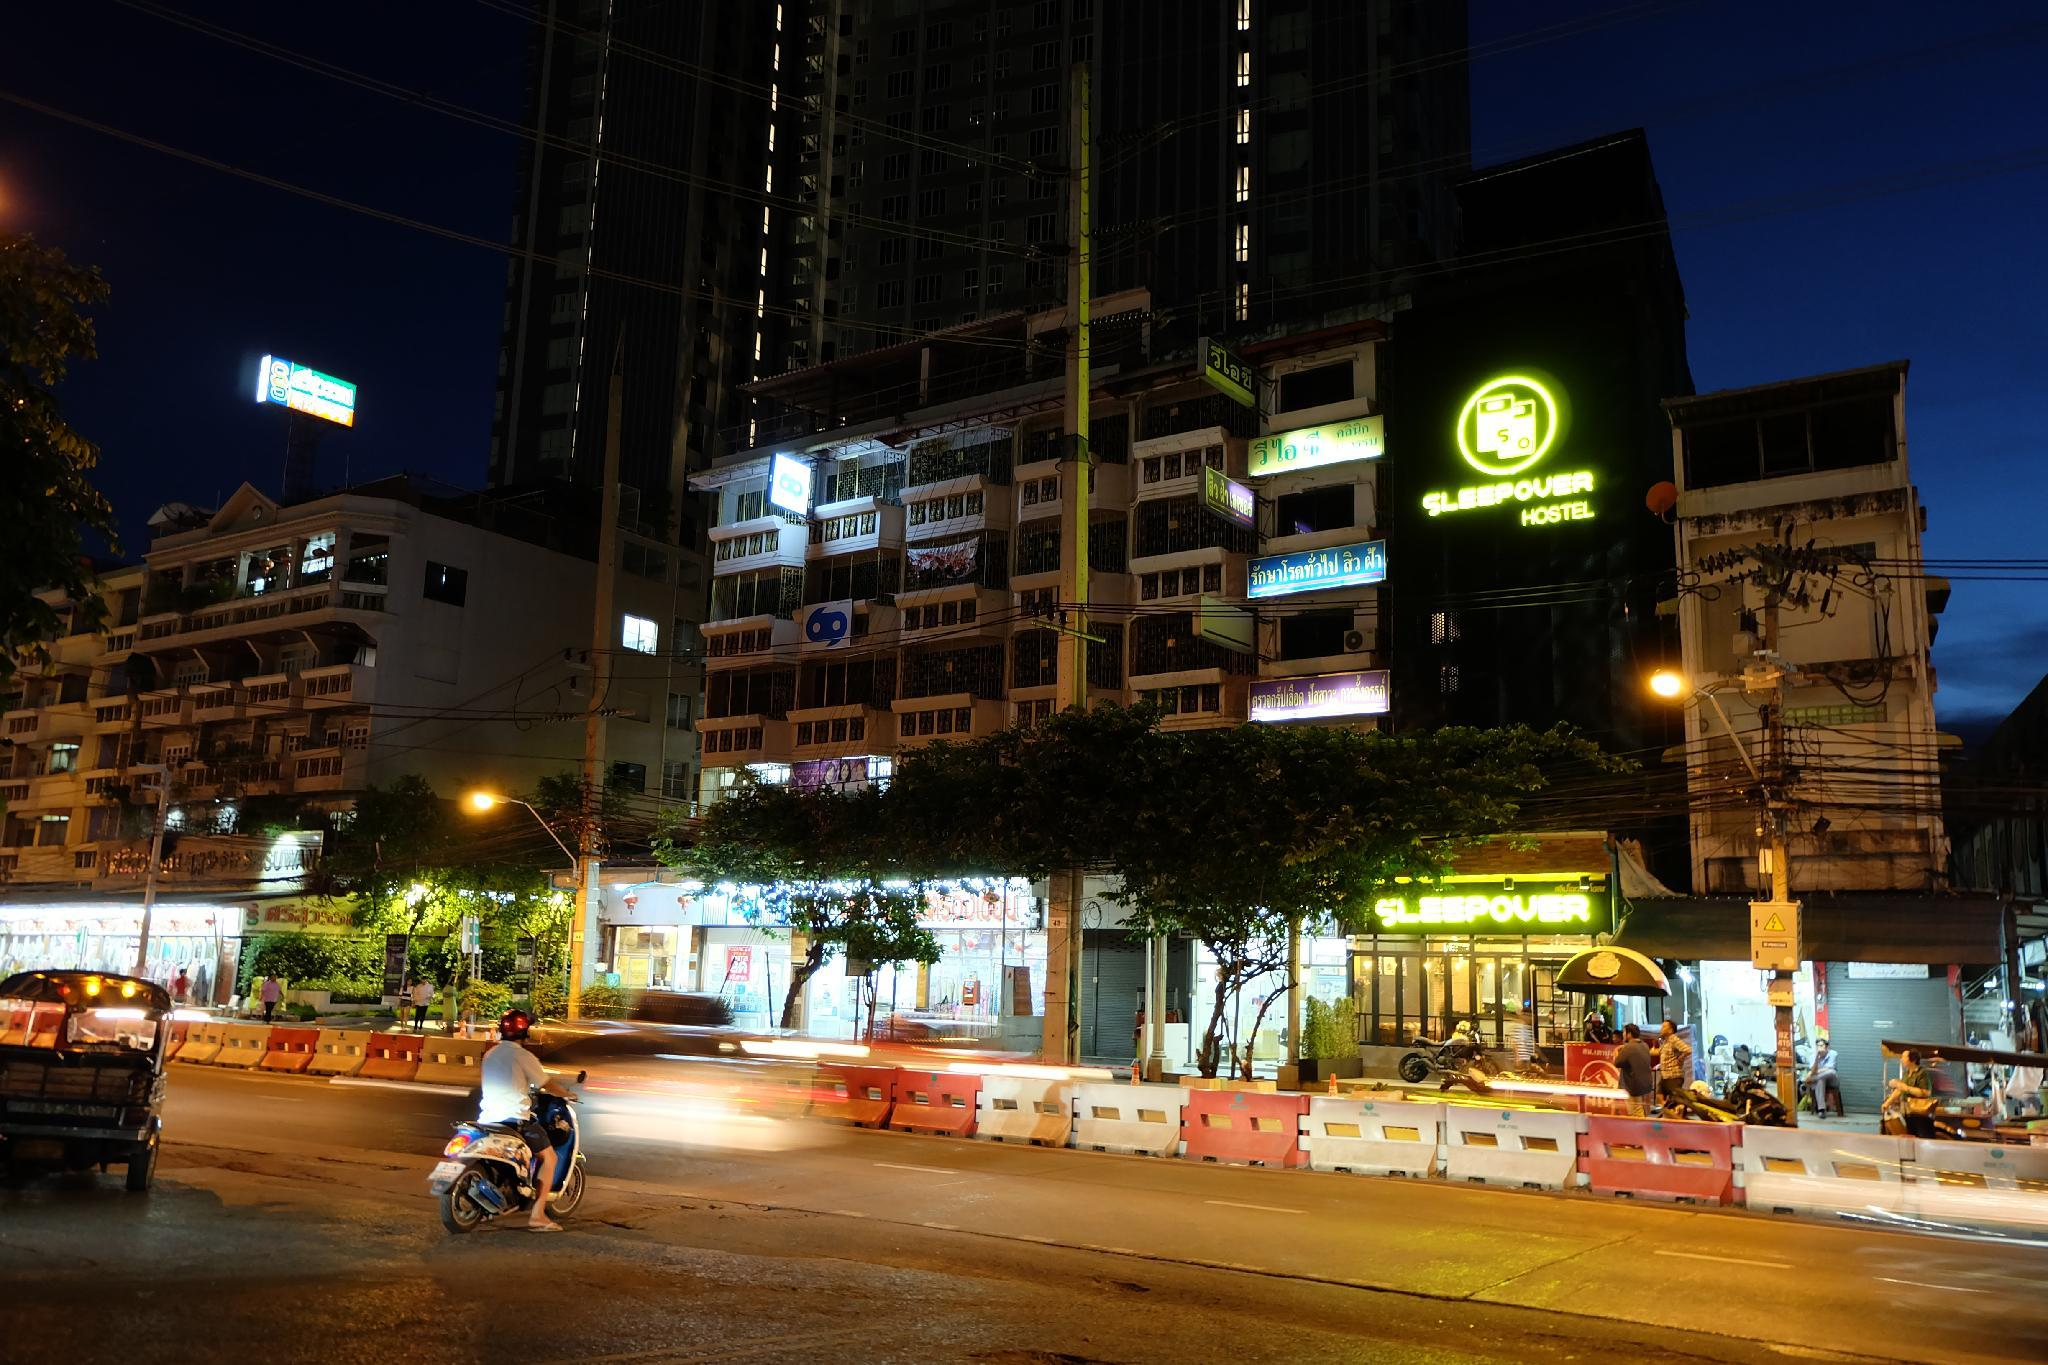 Review Sleepover Hostel Bangkok